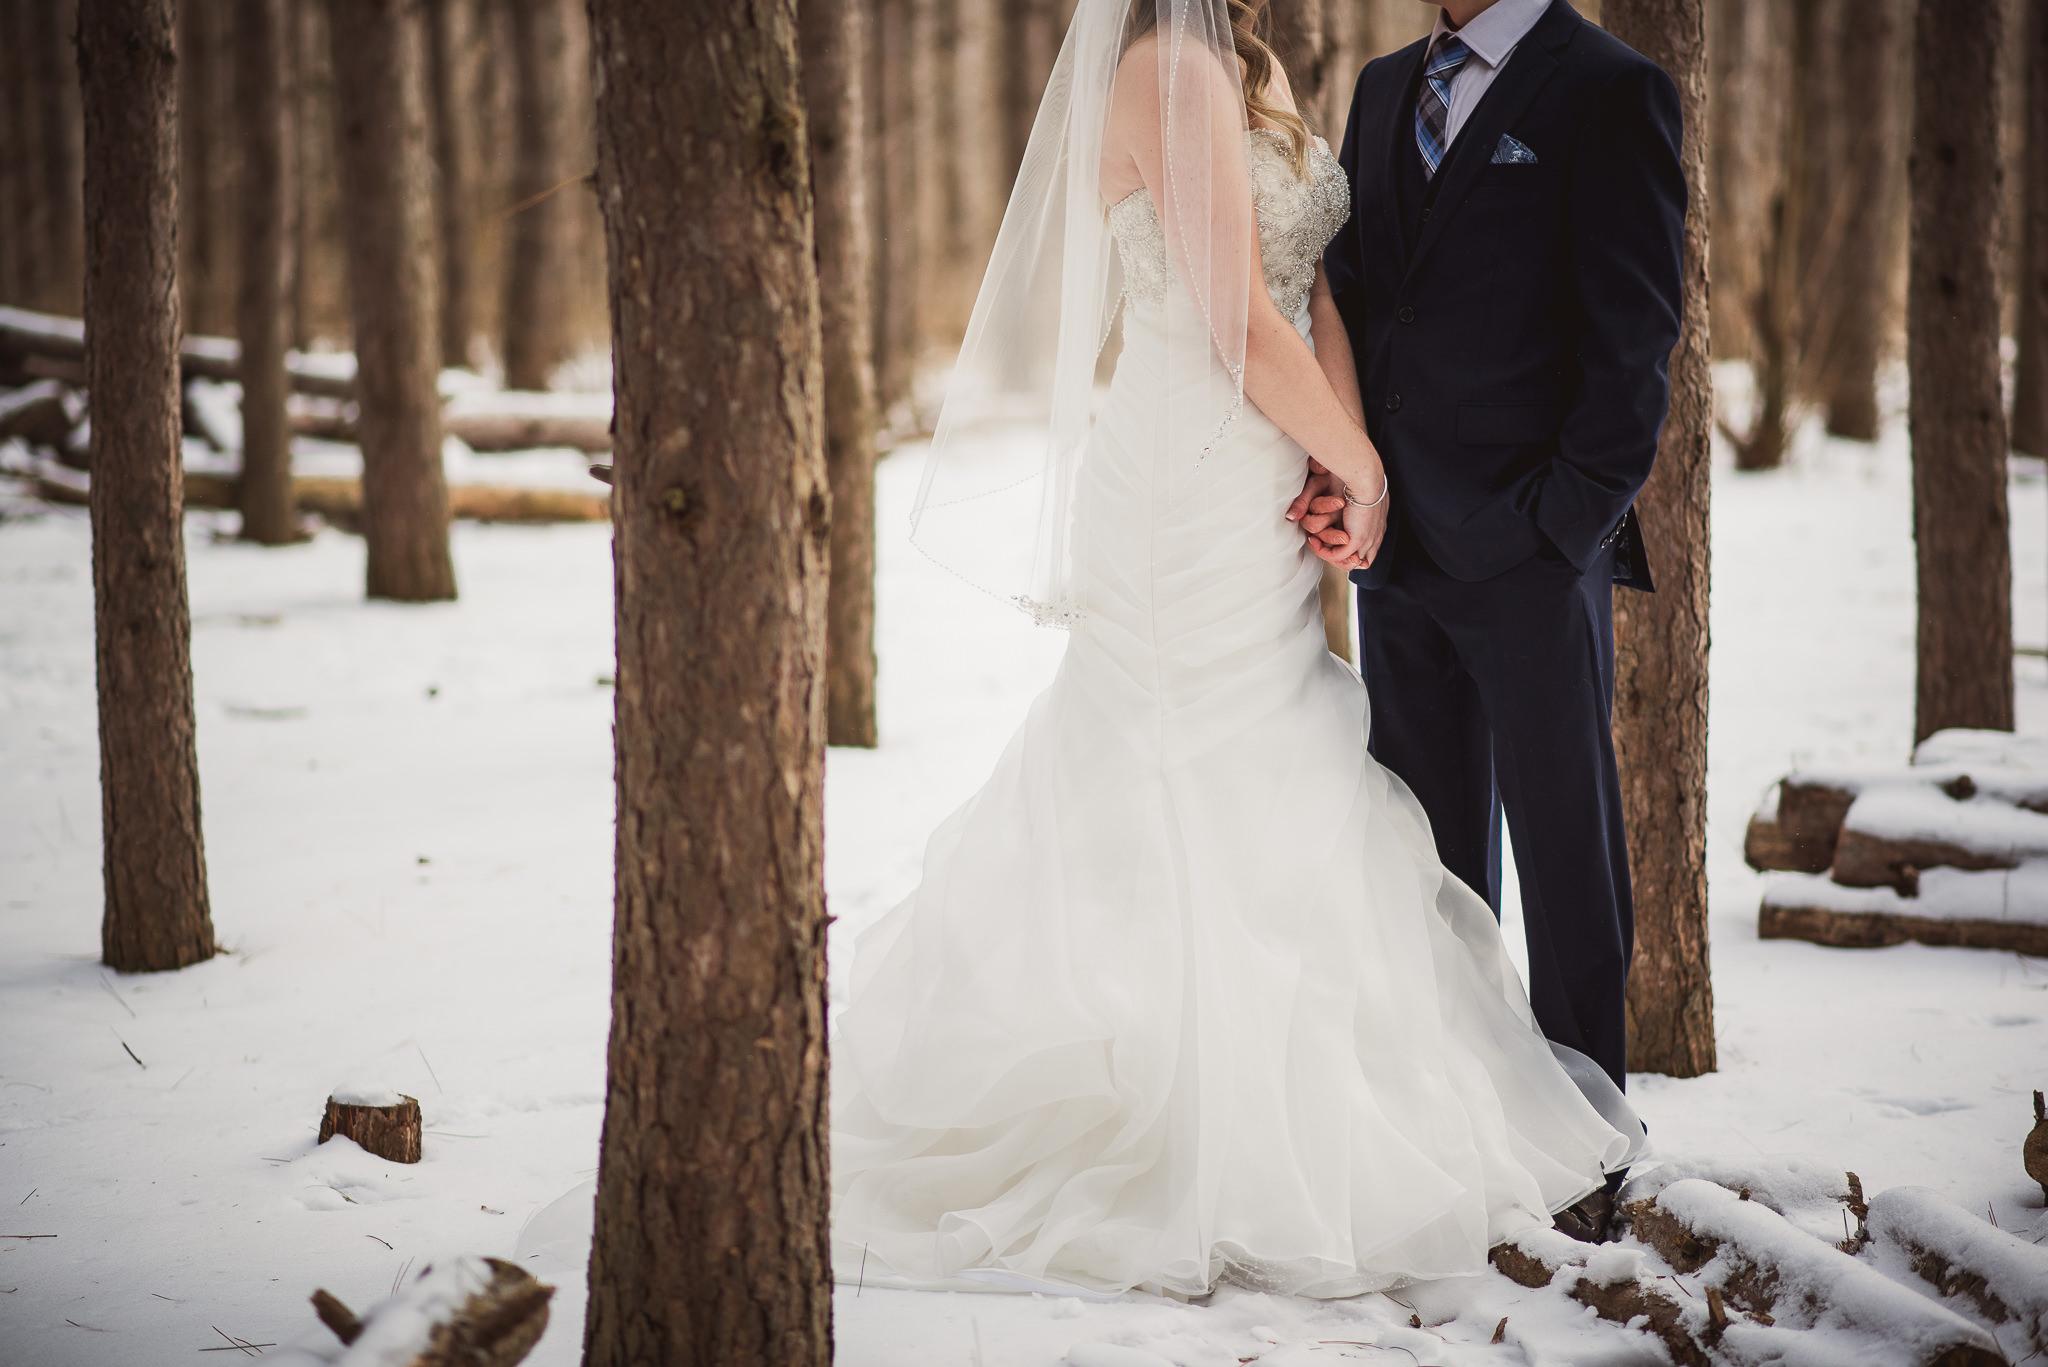 kortright center winter wedding photos 149 - Kortright Center Winter Wedding Photos